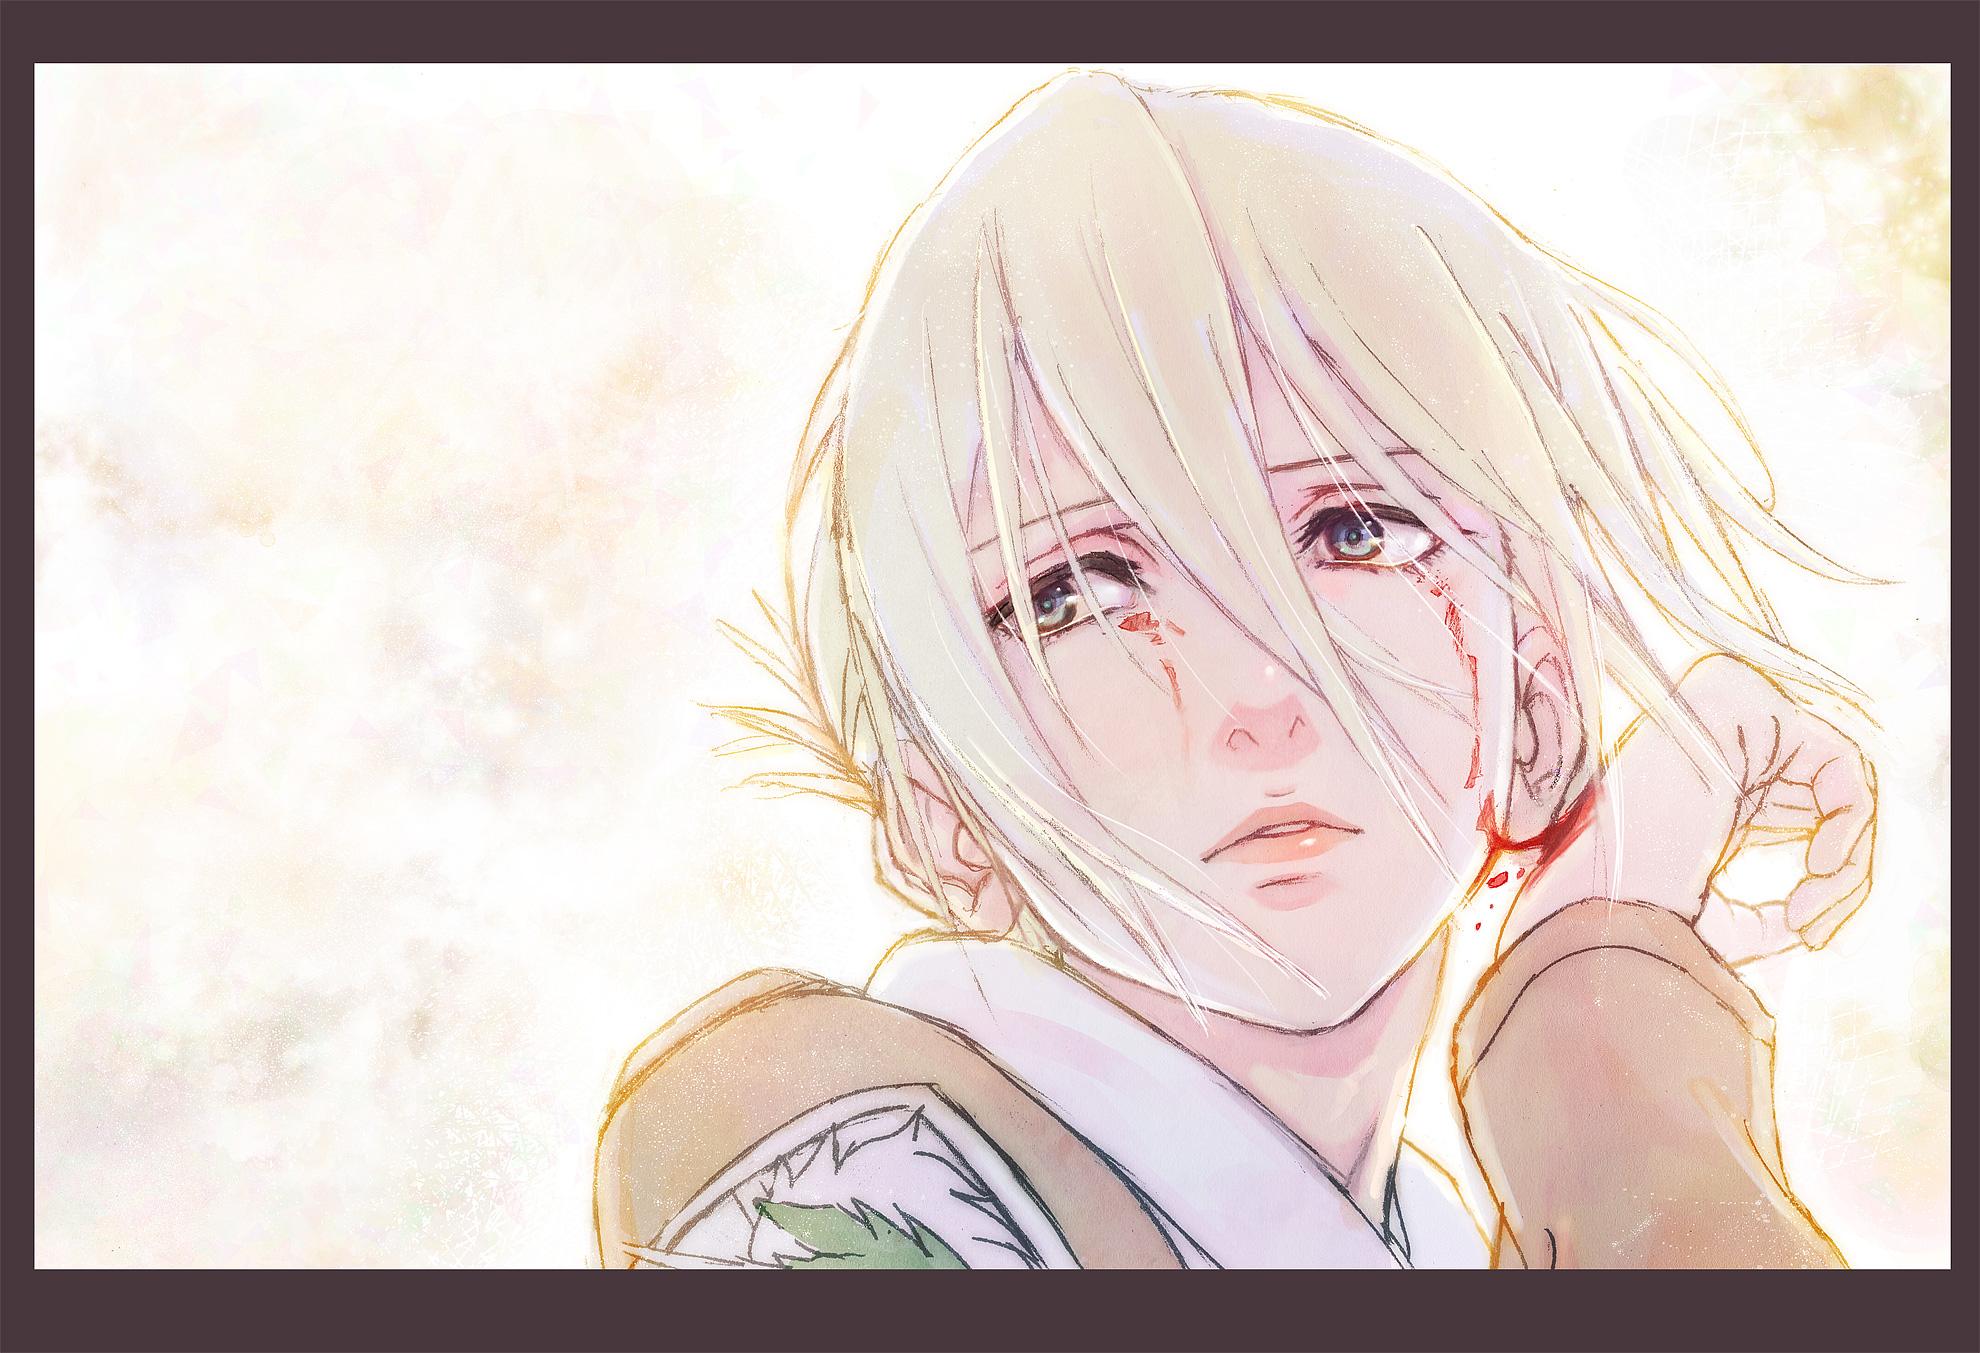 Annie Leonhardt Blonde Hair Blood Blue Eyes Close Piroaki Shingeki No Kyojin Short Hair Uniform White Konachan Com Konachan Com Anime Wallpapers